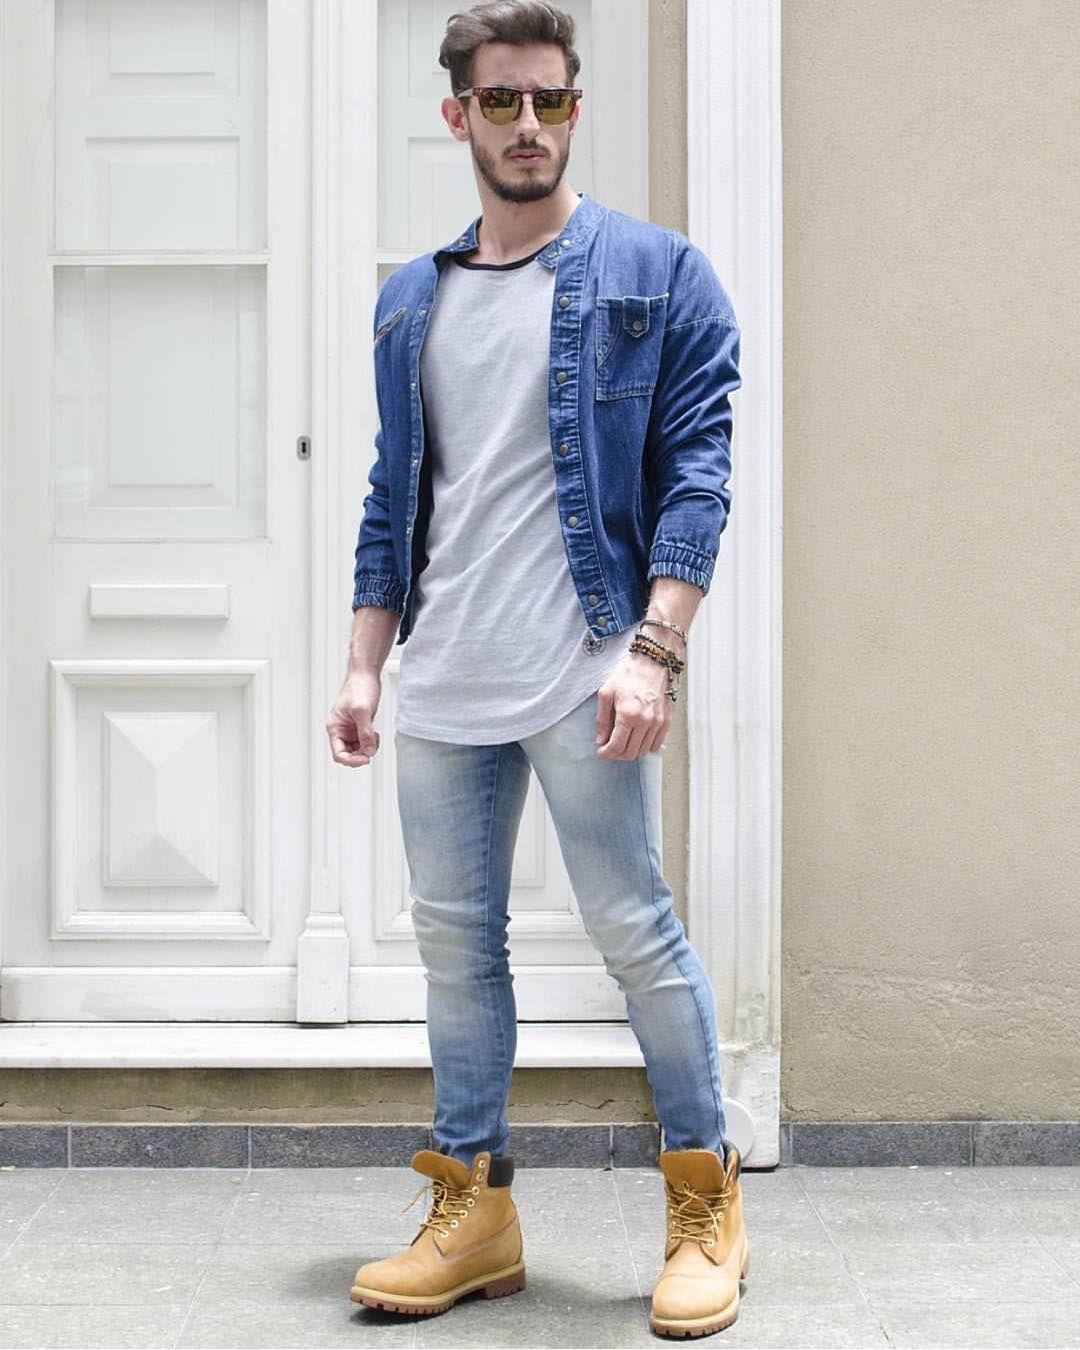 Men style fashion look clothing clothes man ropa moda para hombres outfit  models moda masculina urbano